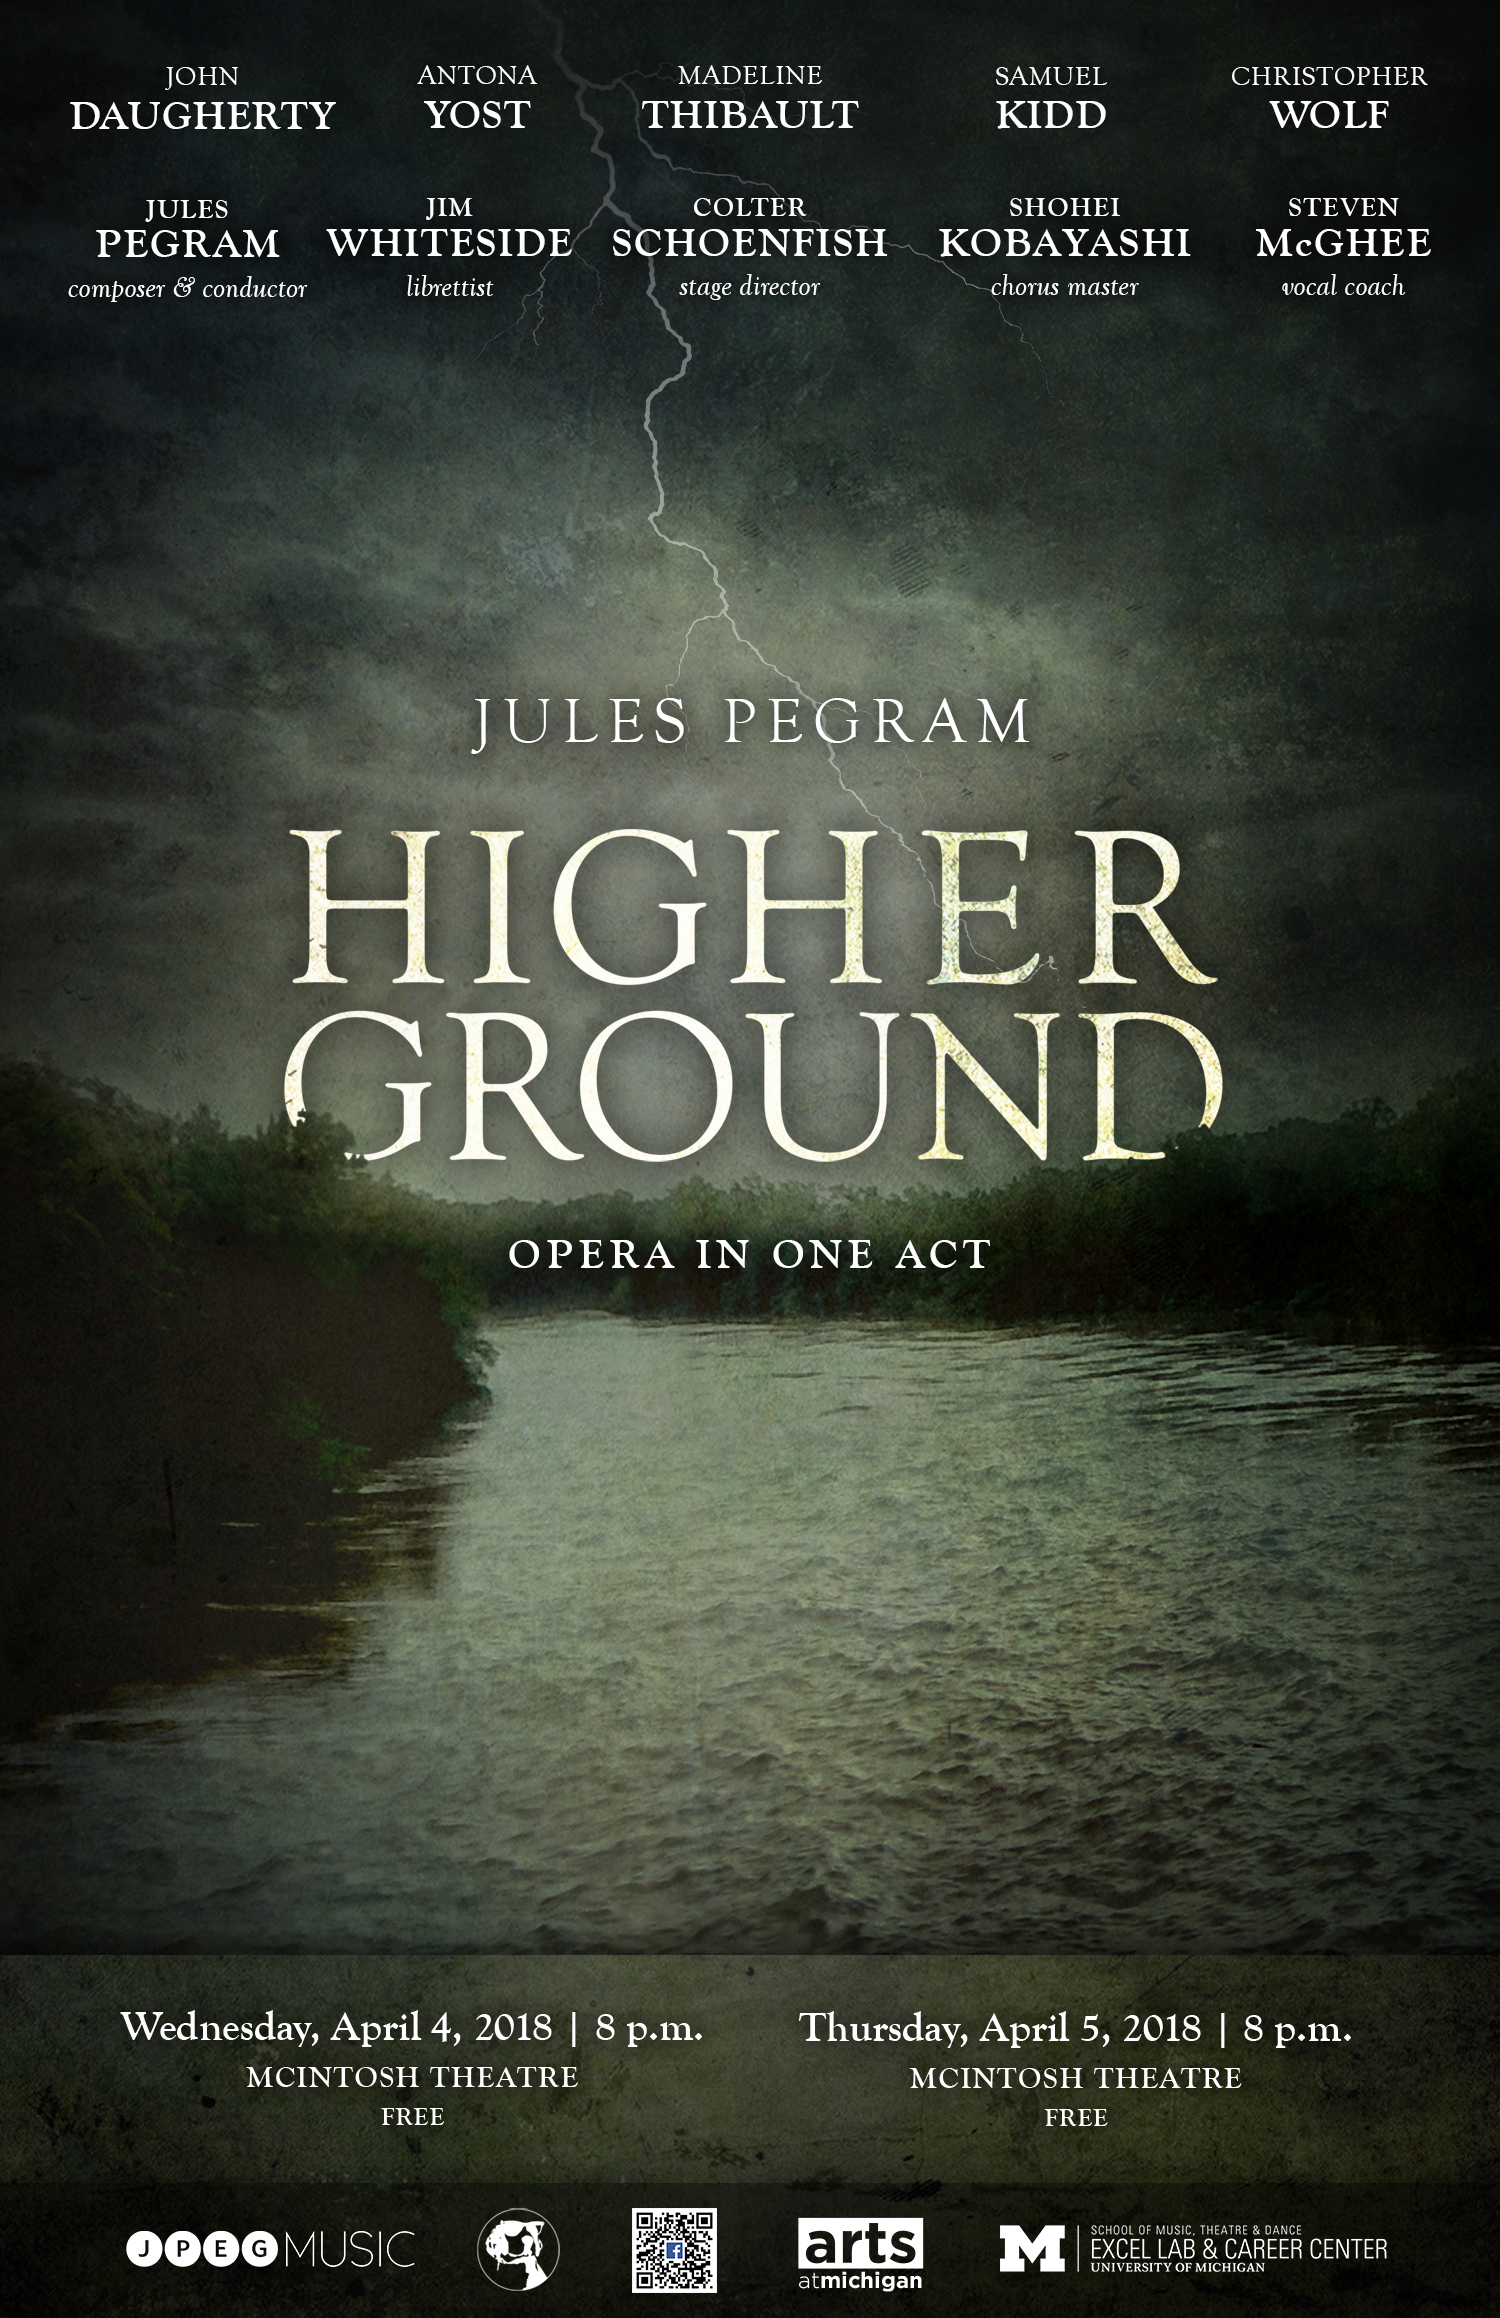 JulesPegram_HigherGround_Poster-web-lowres-1.jpg